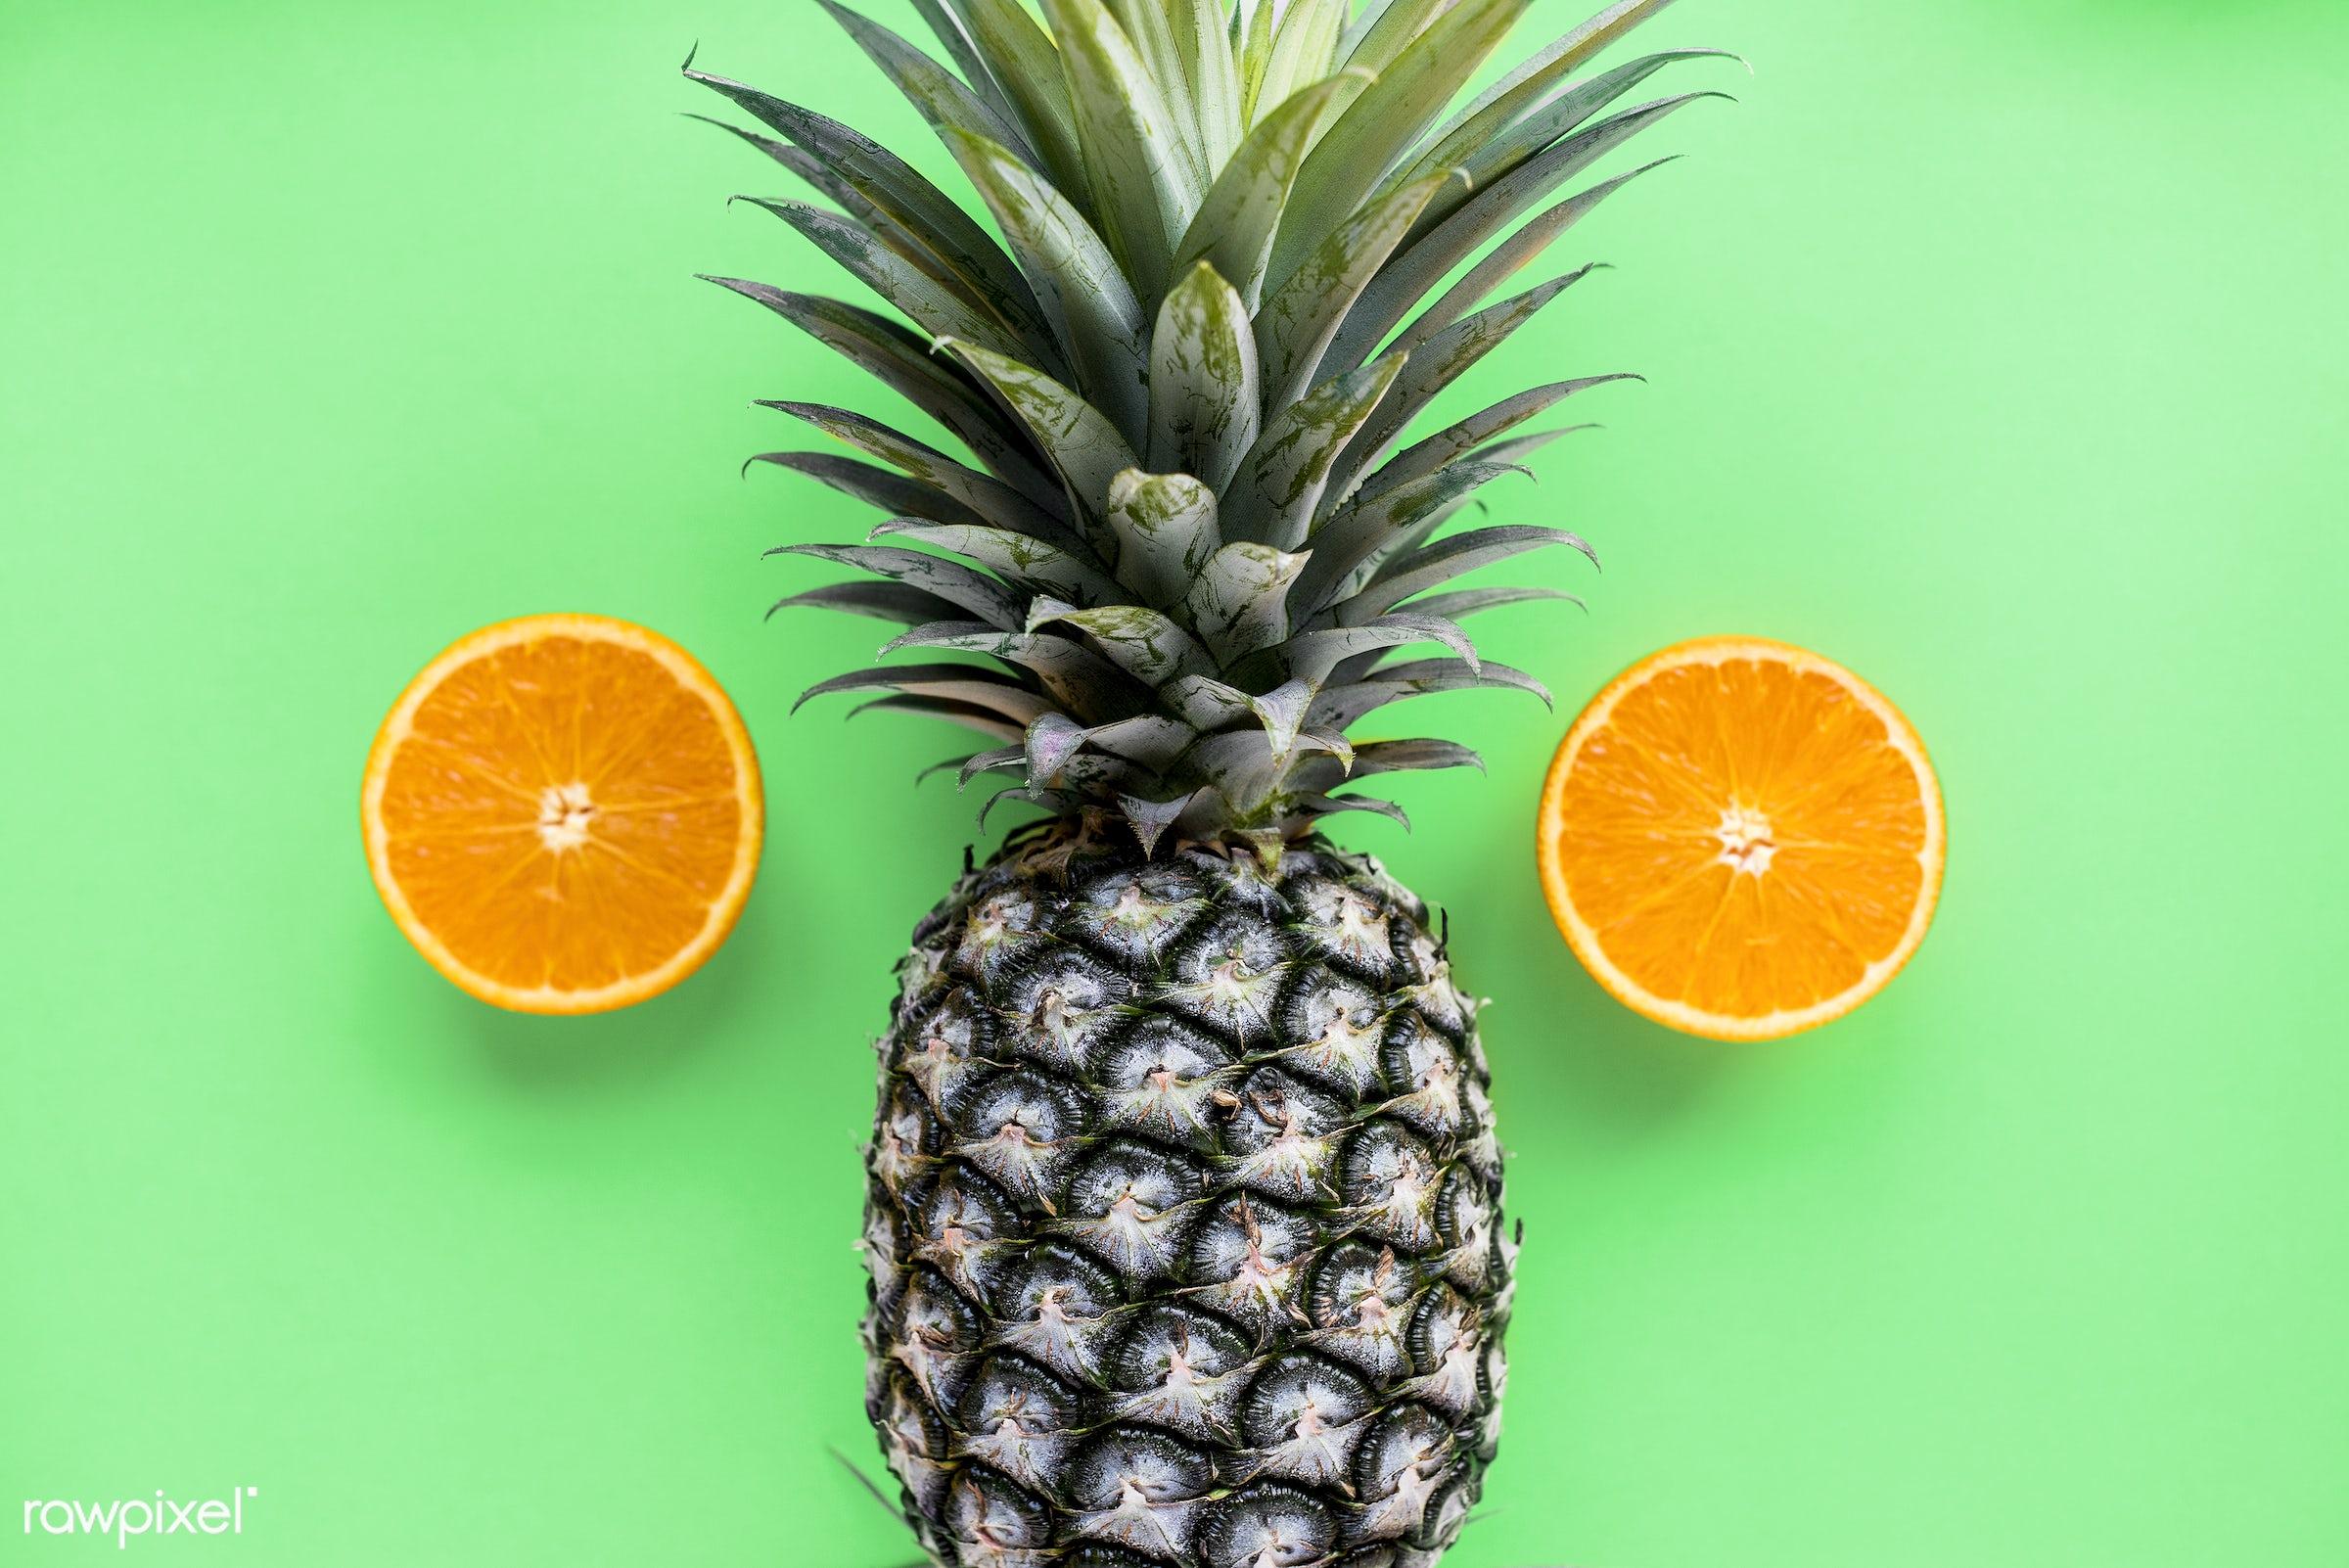 juicy, nutritious, tropical, round, refreshing, hawaiian, vitamins, fresh, juice, antioxidant, piece, orange, isolated,...